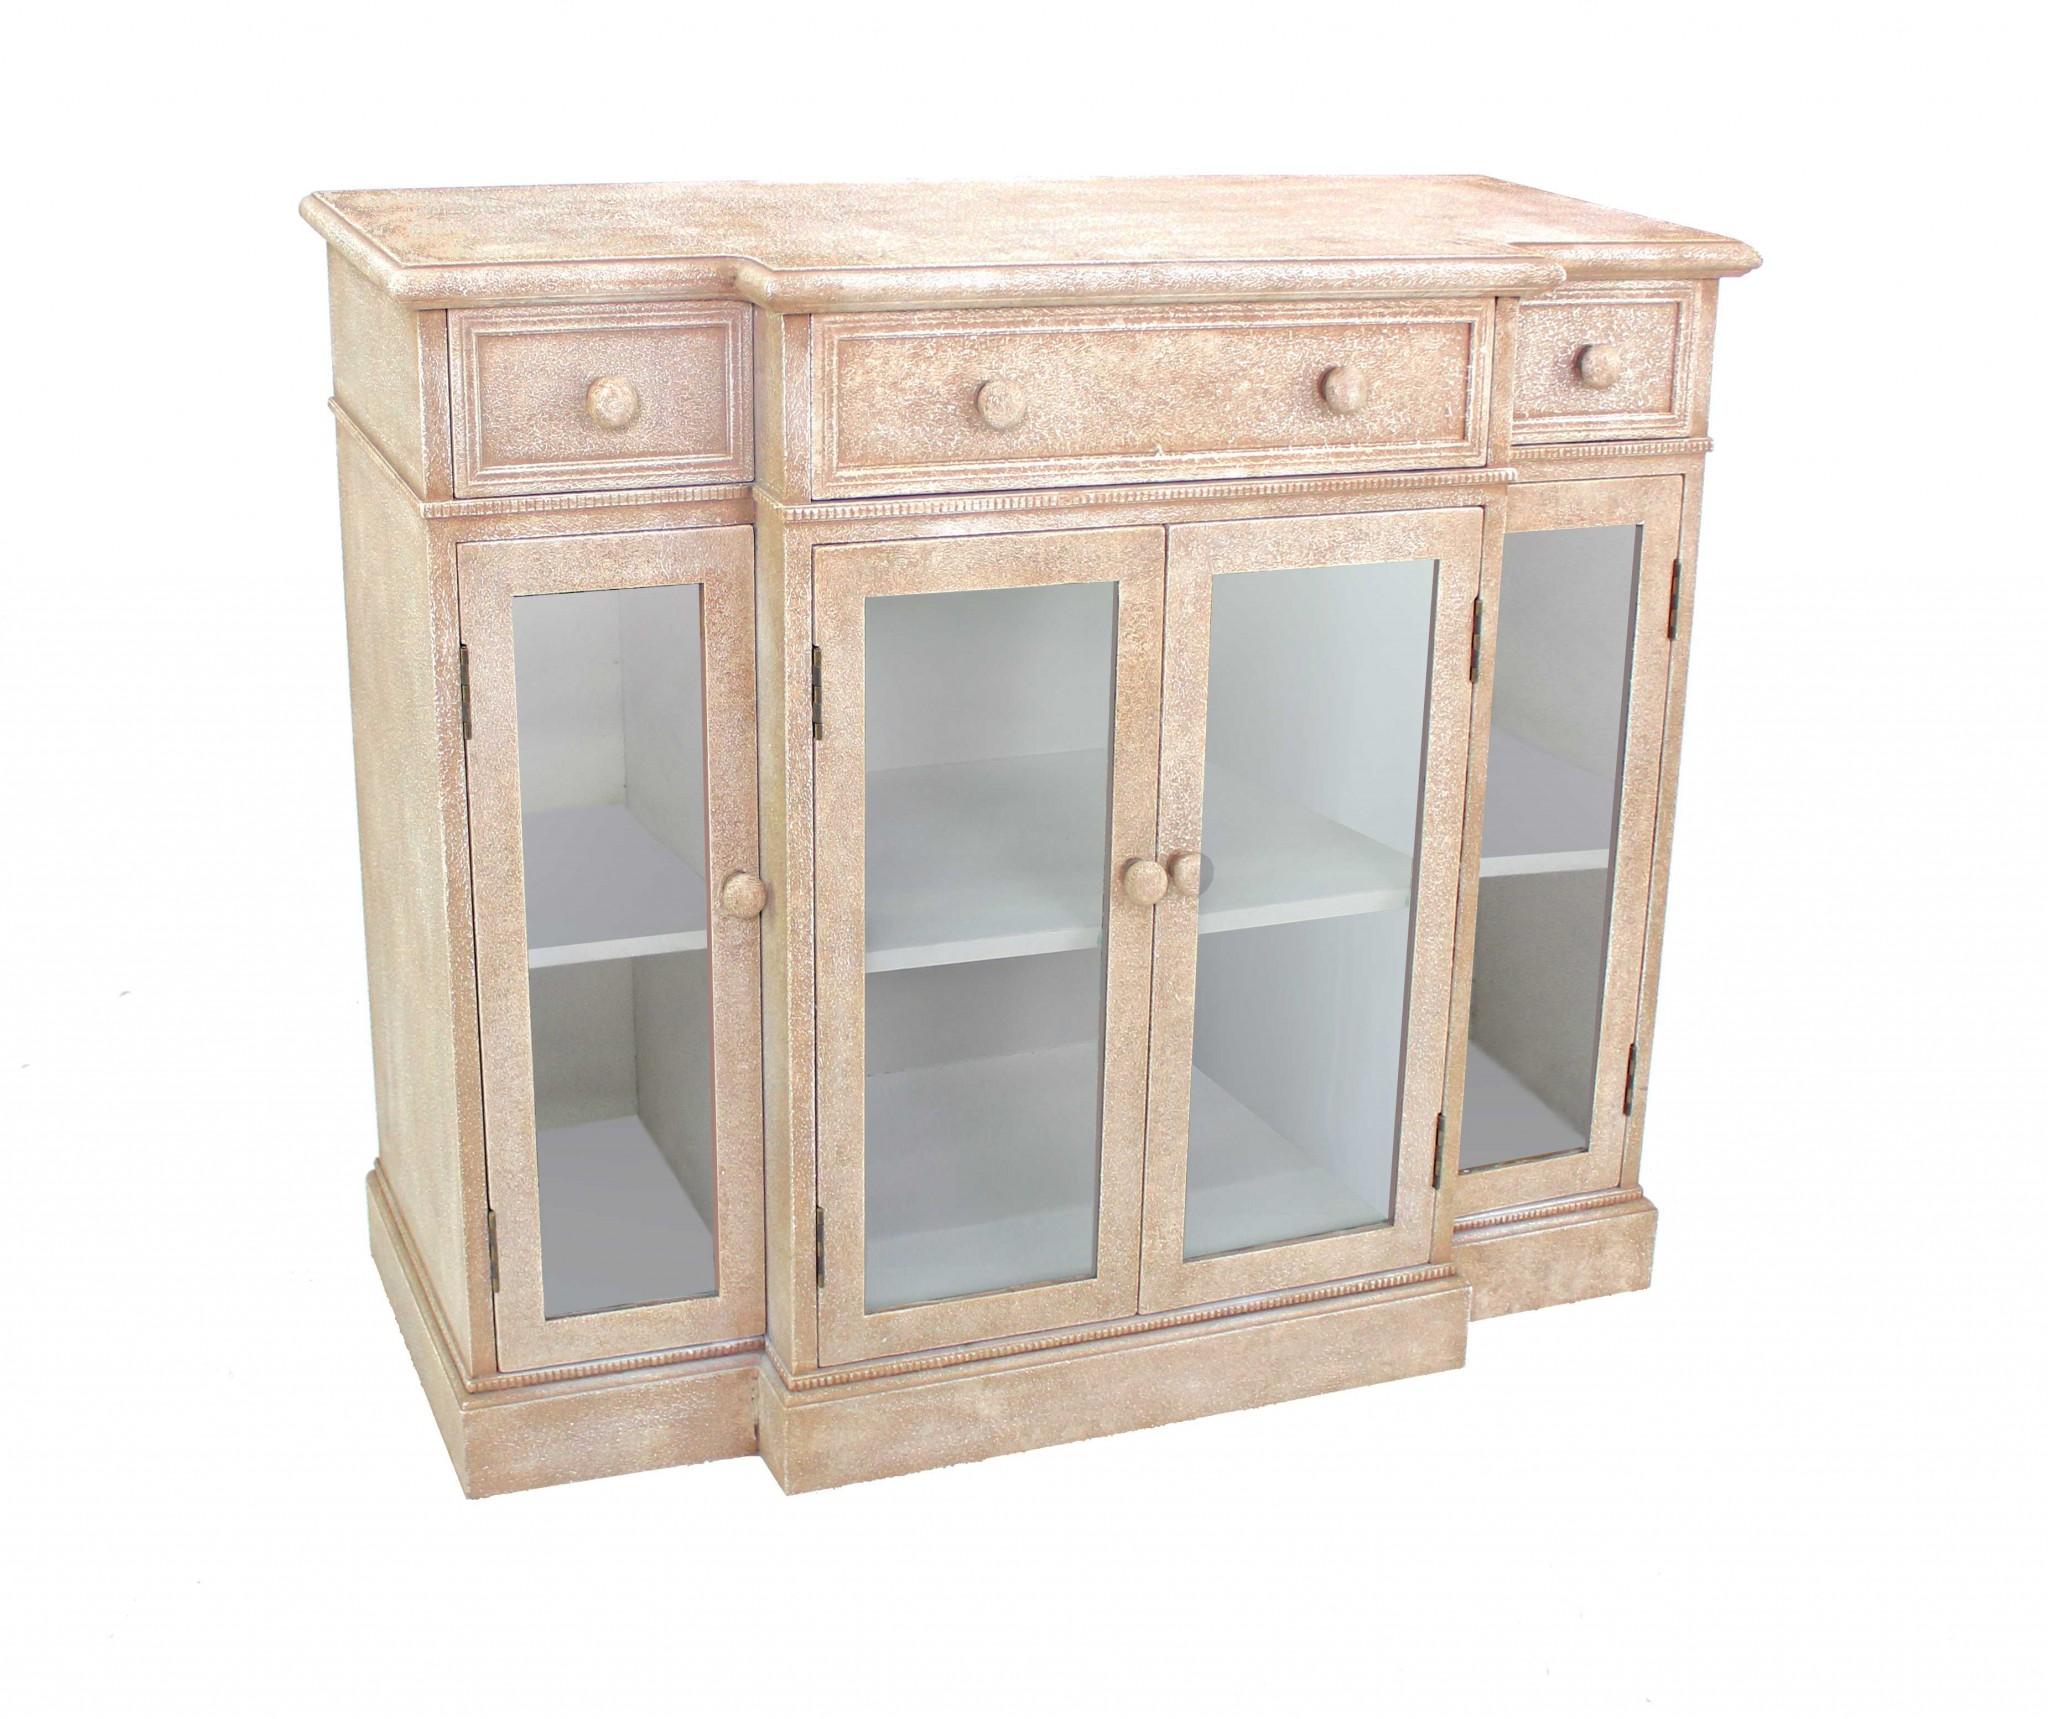 "14"" x 42"" x 34"" Beige, Vintage, French Style, Distressed - Hallway Cabinet"